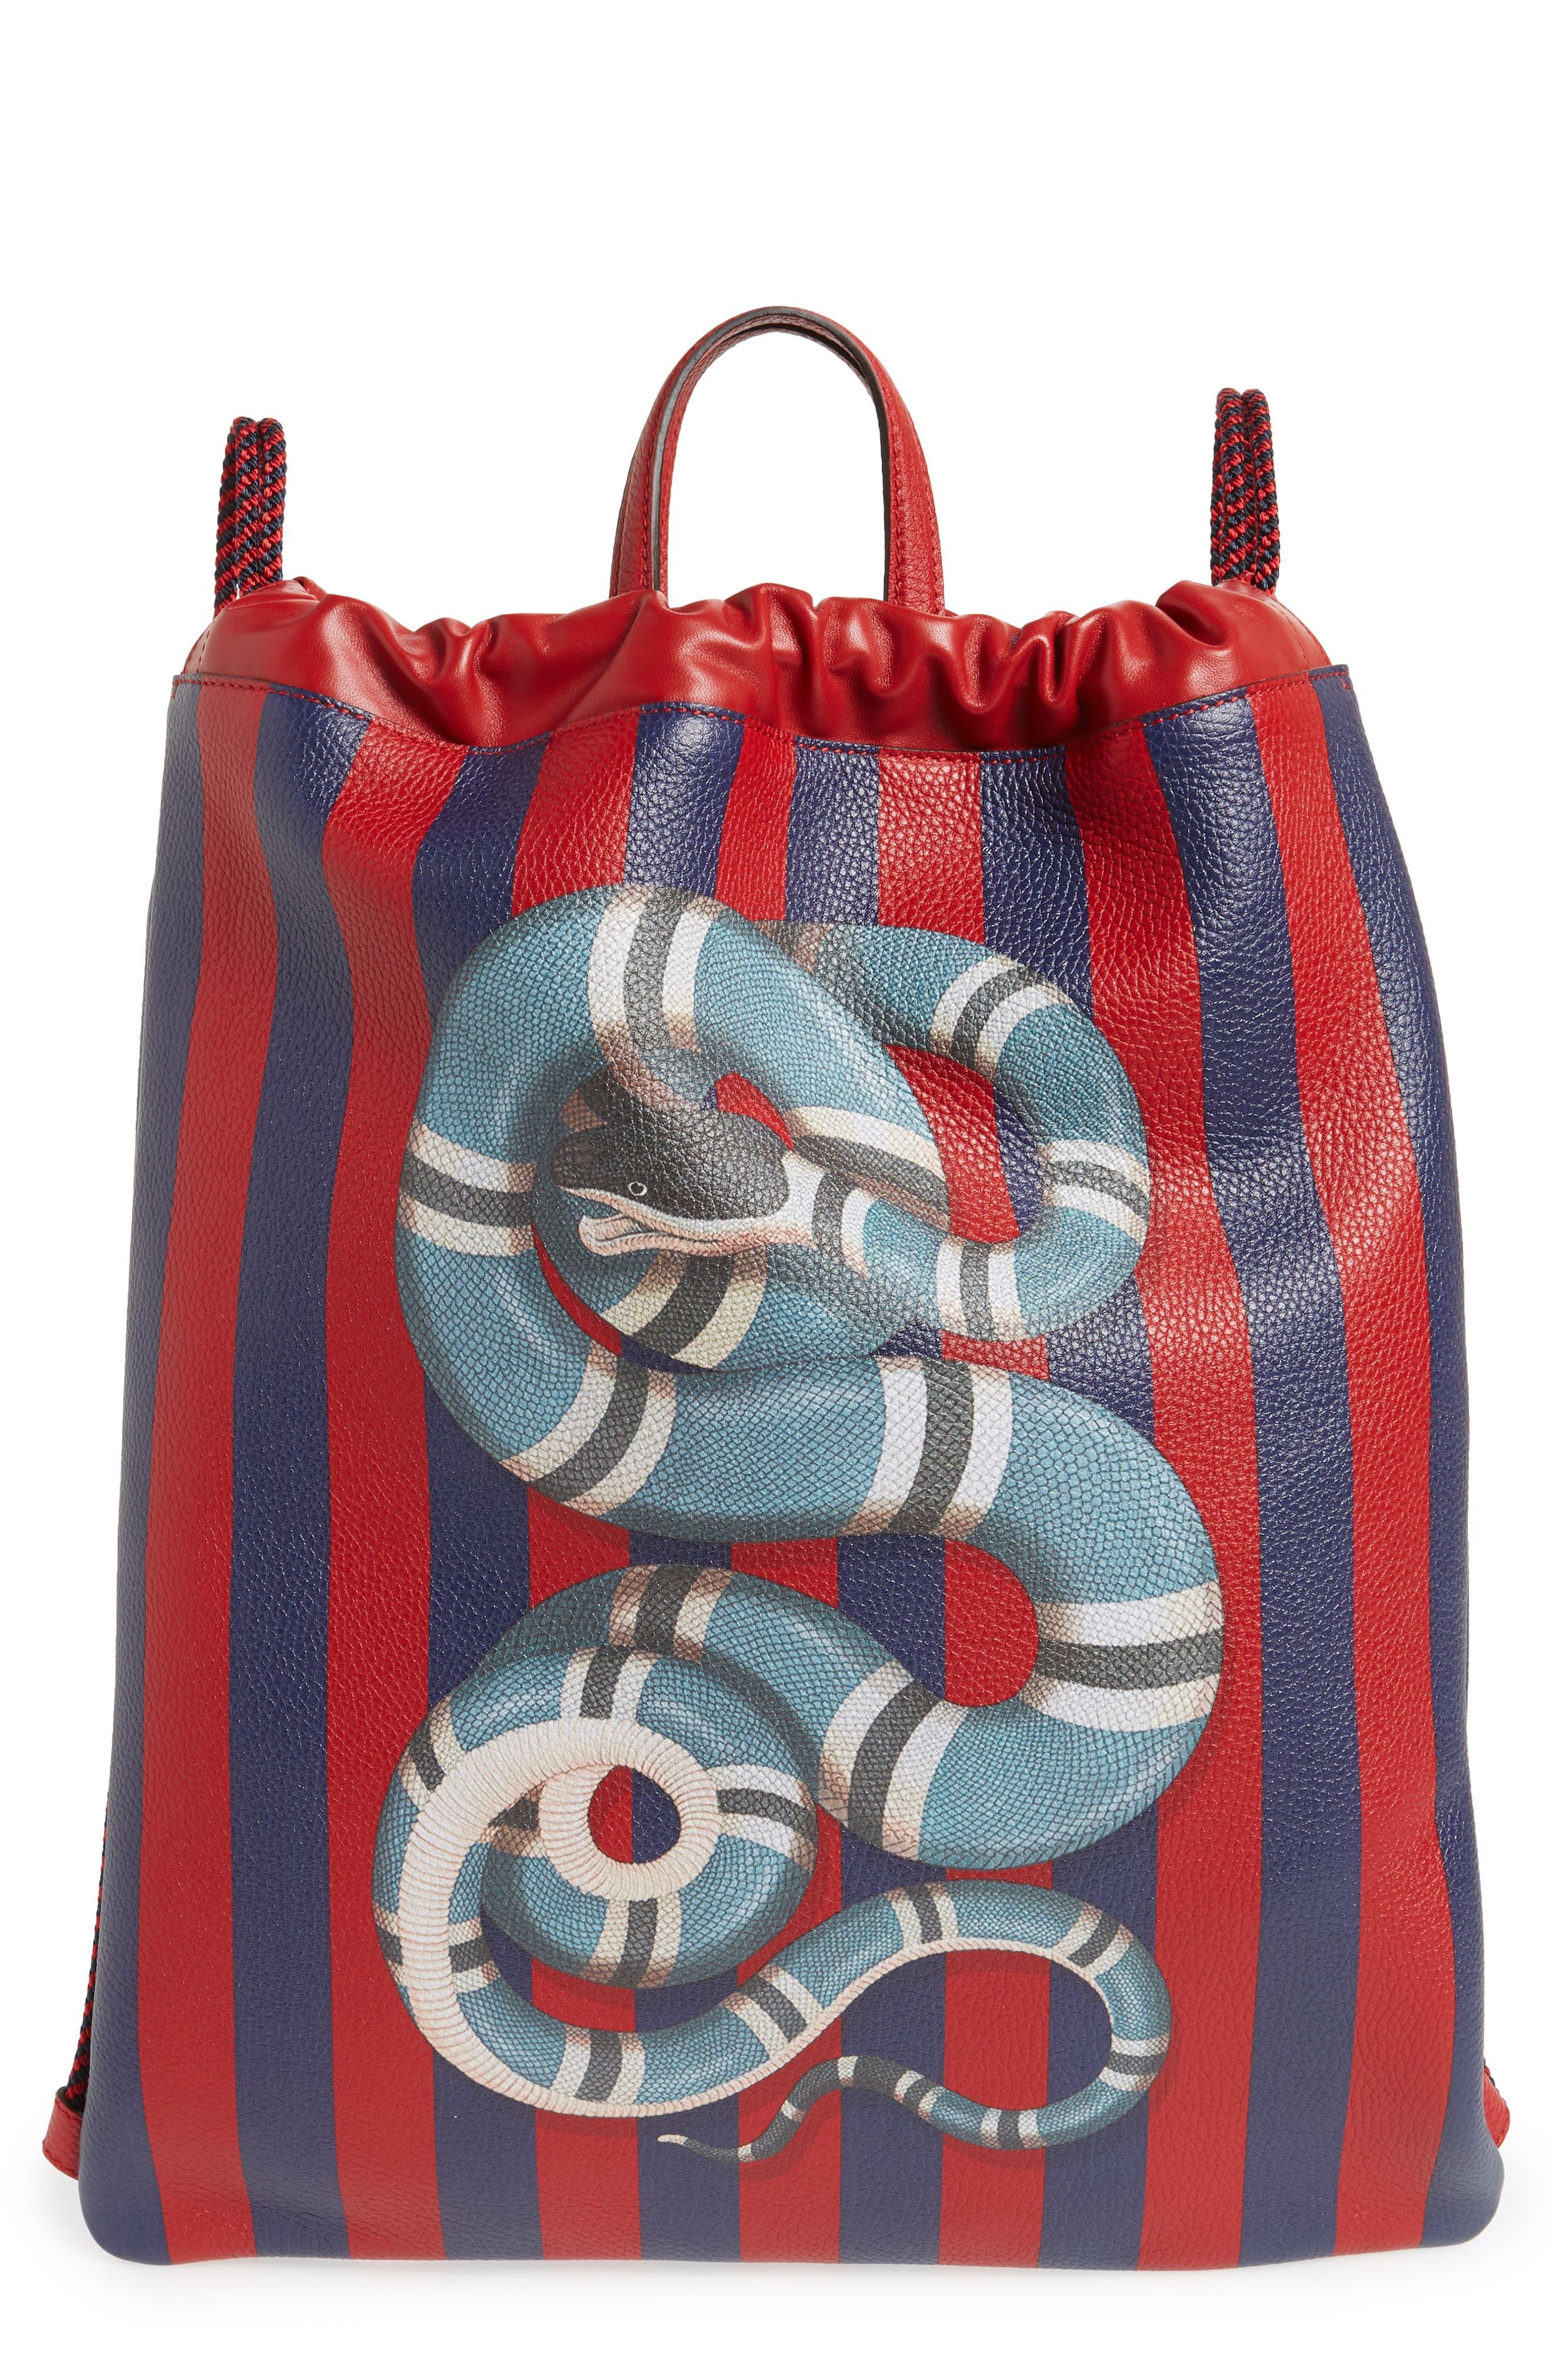 Kingsnake Stripe Leather Drawstring Backpack,                         Main,                         color, RED